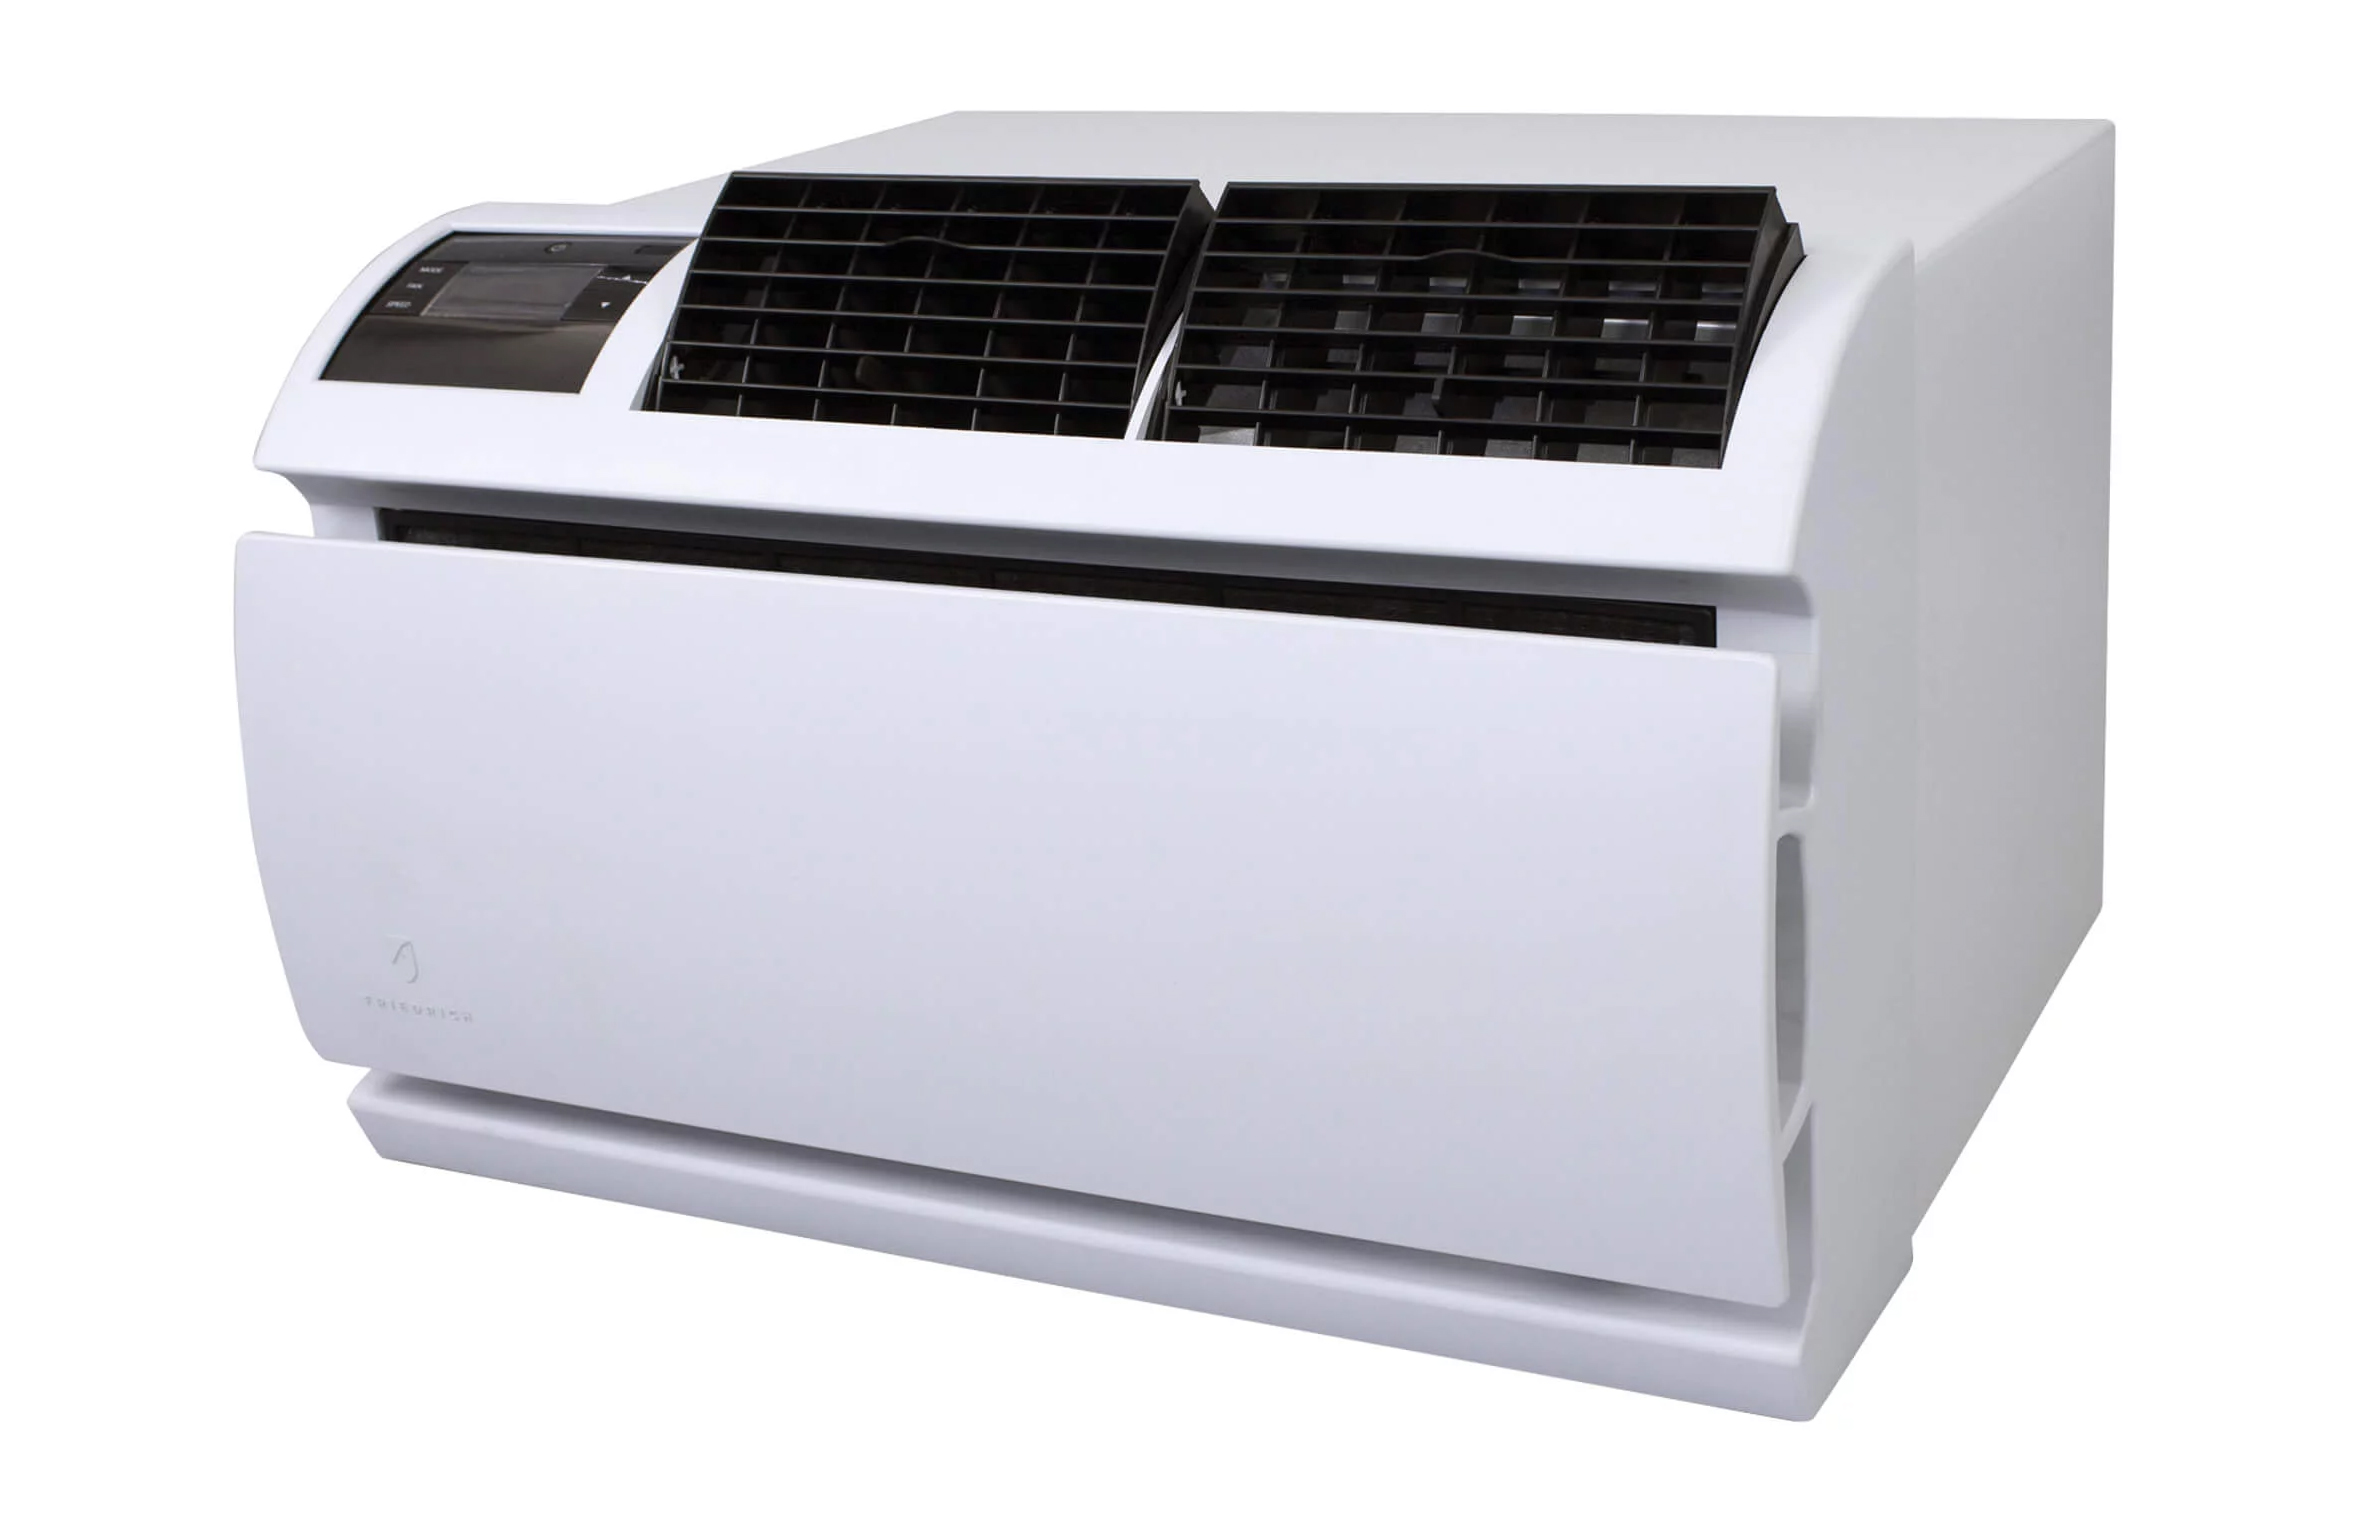 Friedrich WCT12A10A Wallmaster Series 12000 BTU Smart WiFi Through-the-Wall Air Conditioner - 115 Volt - Energy Star